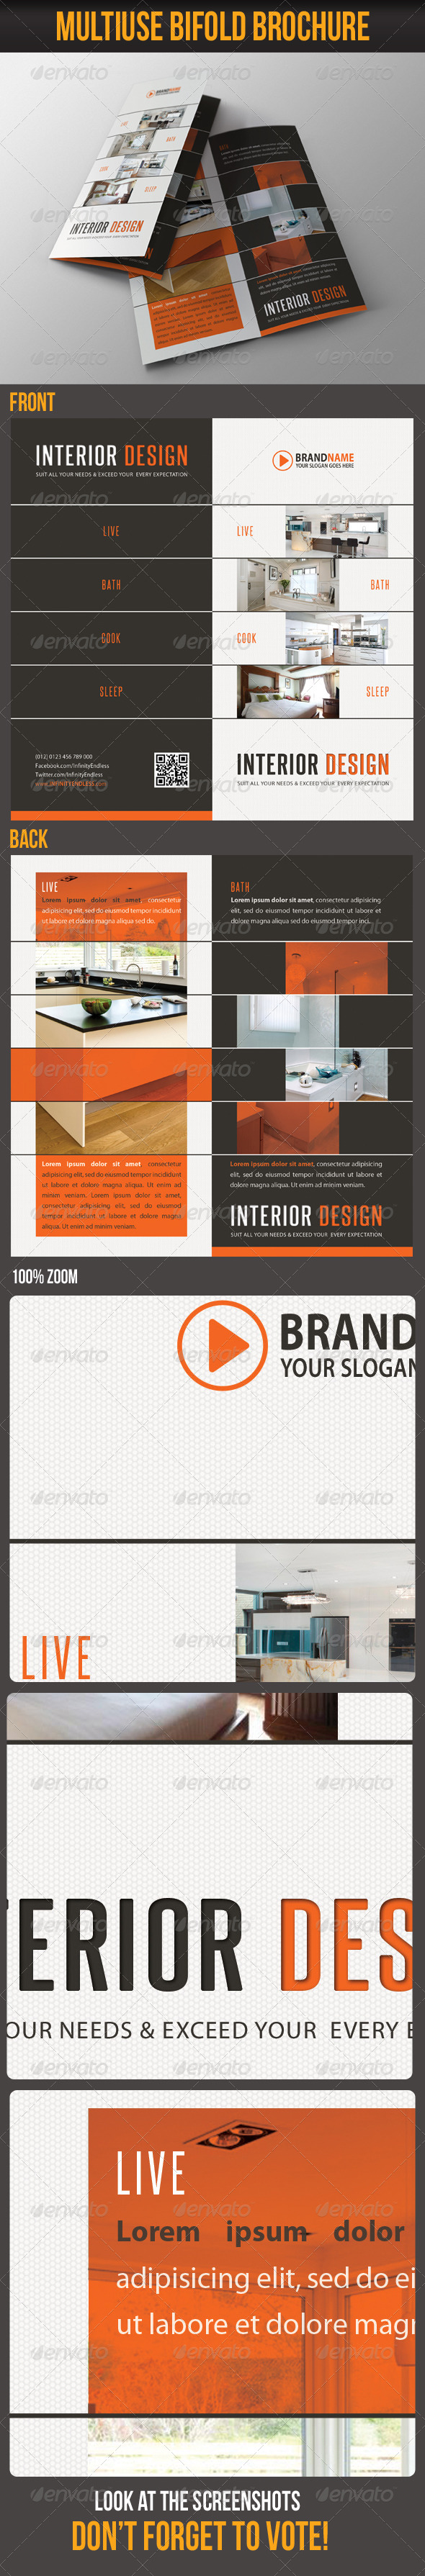 Multiuse Bifold Brochure 29 - Catalogs Brochures